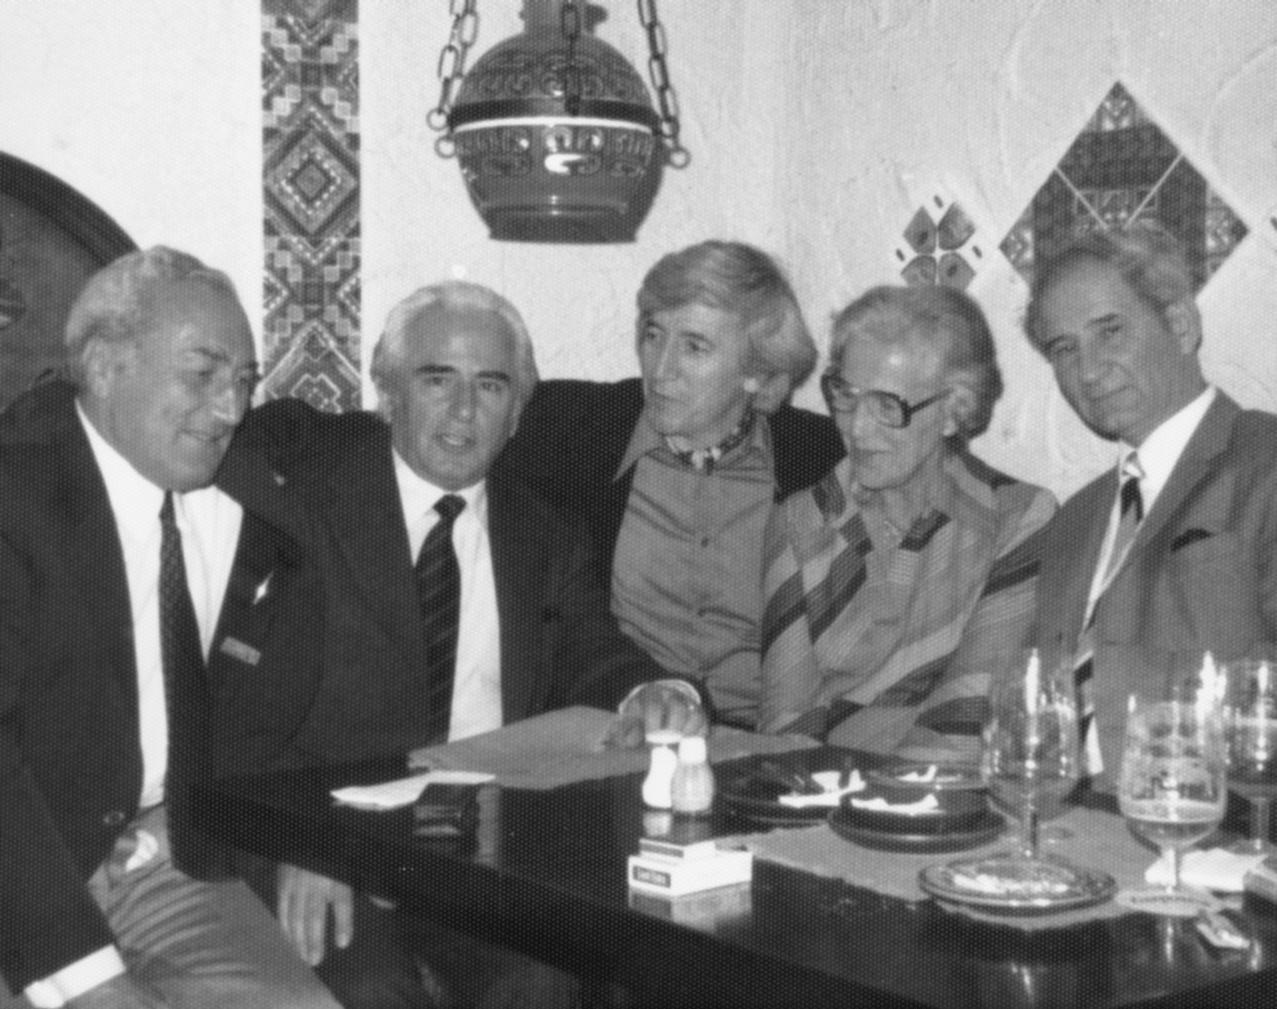 Hristo Damyanov Ognyanov with Bulgarian intellectuals in exil - Milcho Neboliev (editor at Radio 'Free Europe'), Ivan Voynov (lawyer), Asen Mandikov (Bulgarian writer and literary critic, editor at Radio 'Free Europe'), Georgi Markov (writer, journalist), Nadya Kozhuharova (literary critic and translator). Munich, [1977-1978].